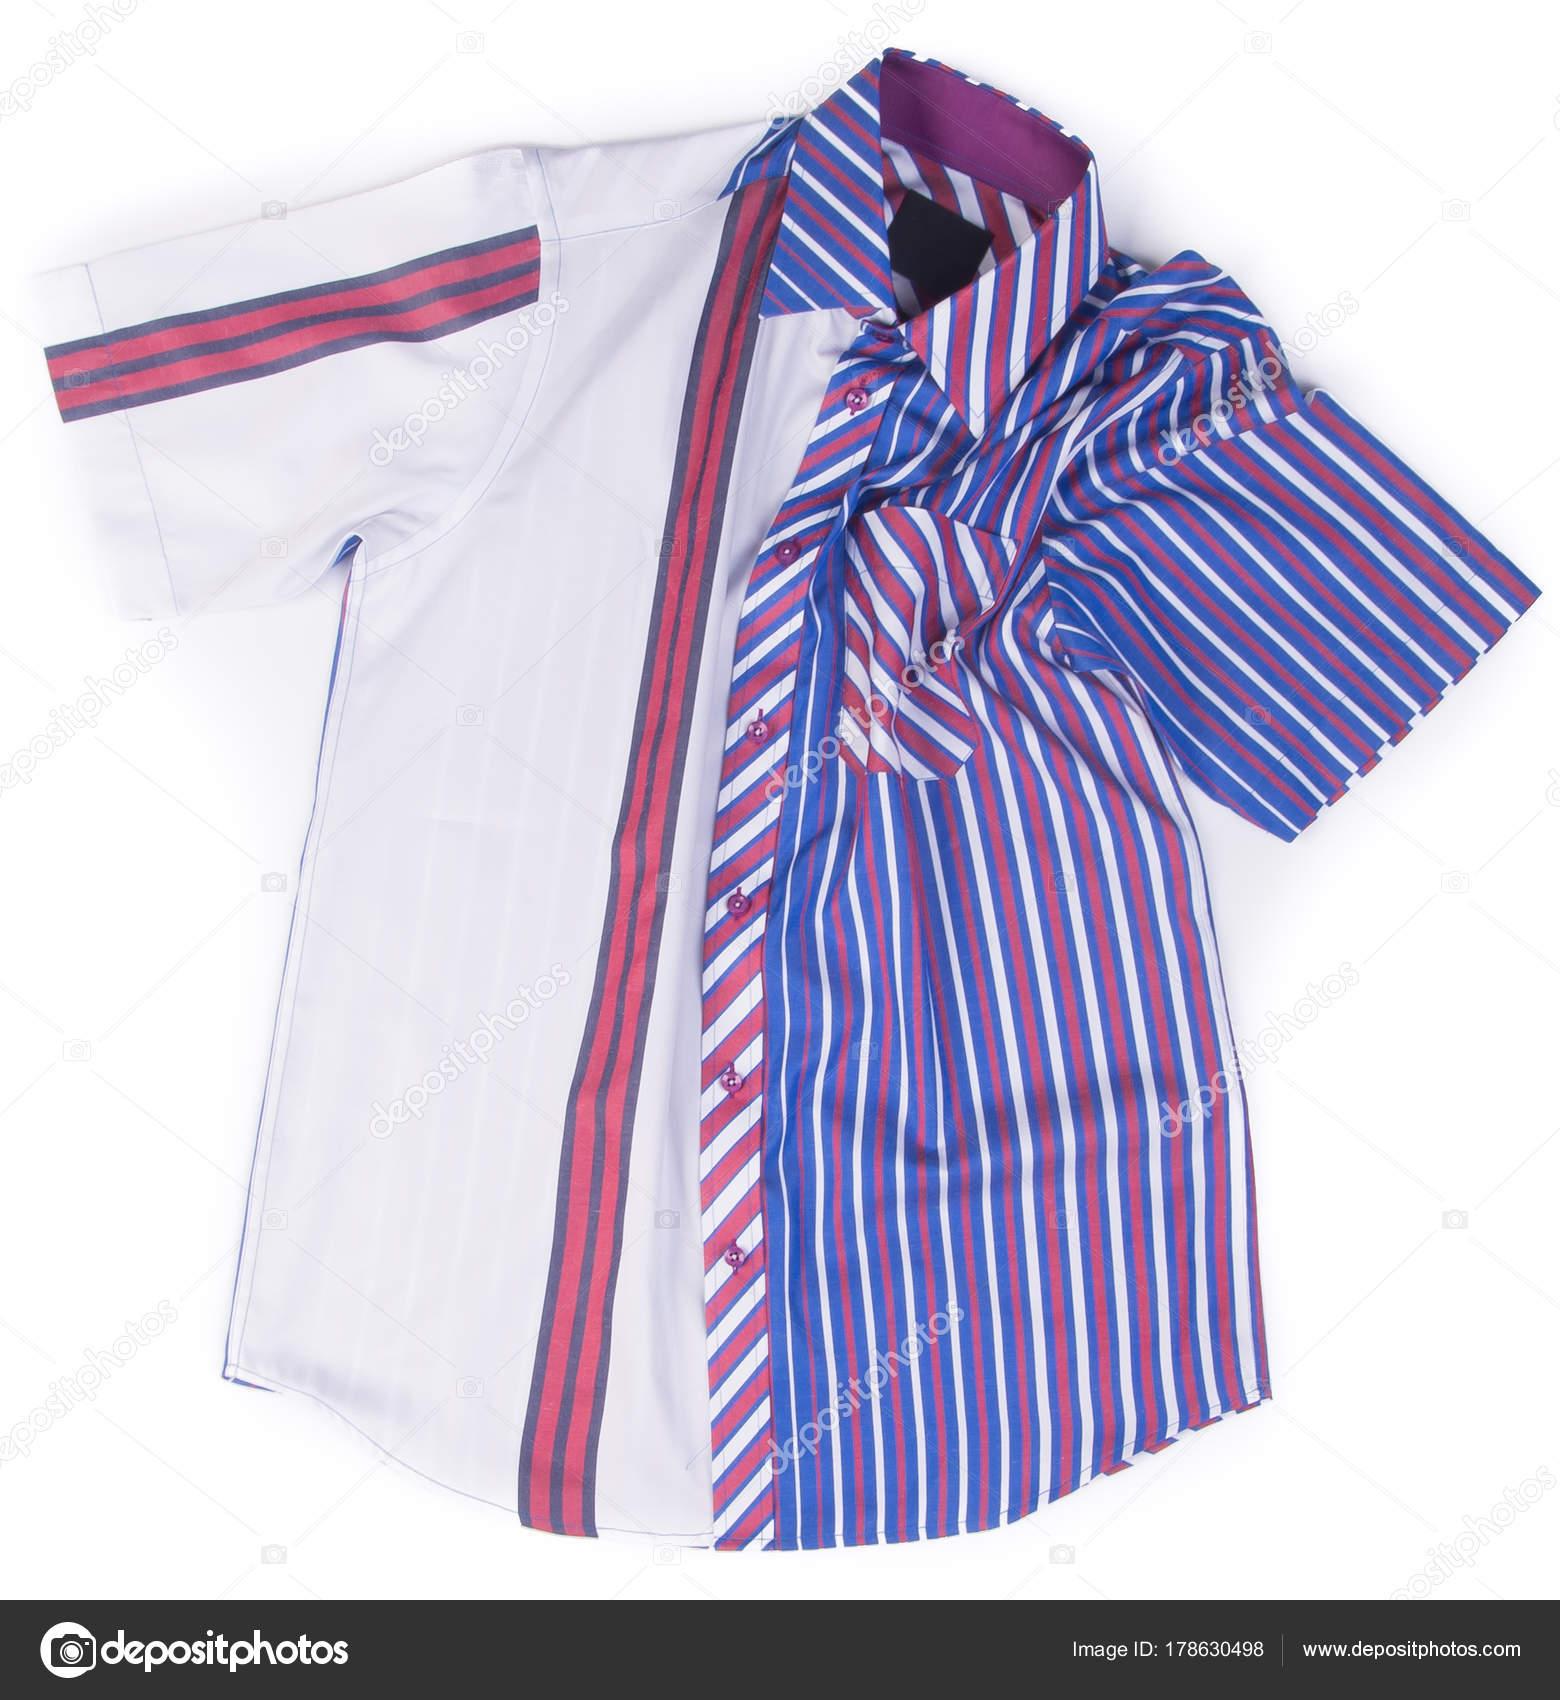 9e721e0f0a80 πουκάμισα. ανδρικά πουκάμισα μόδας σε φόντο — Φωτογραφία Αρχείου ...